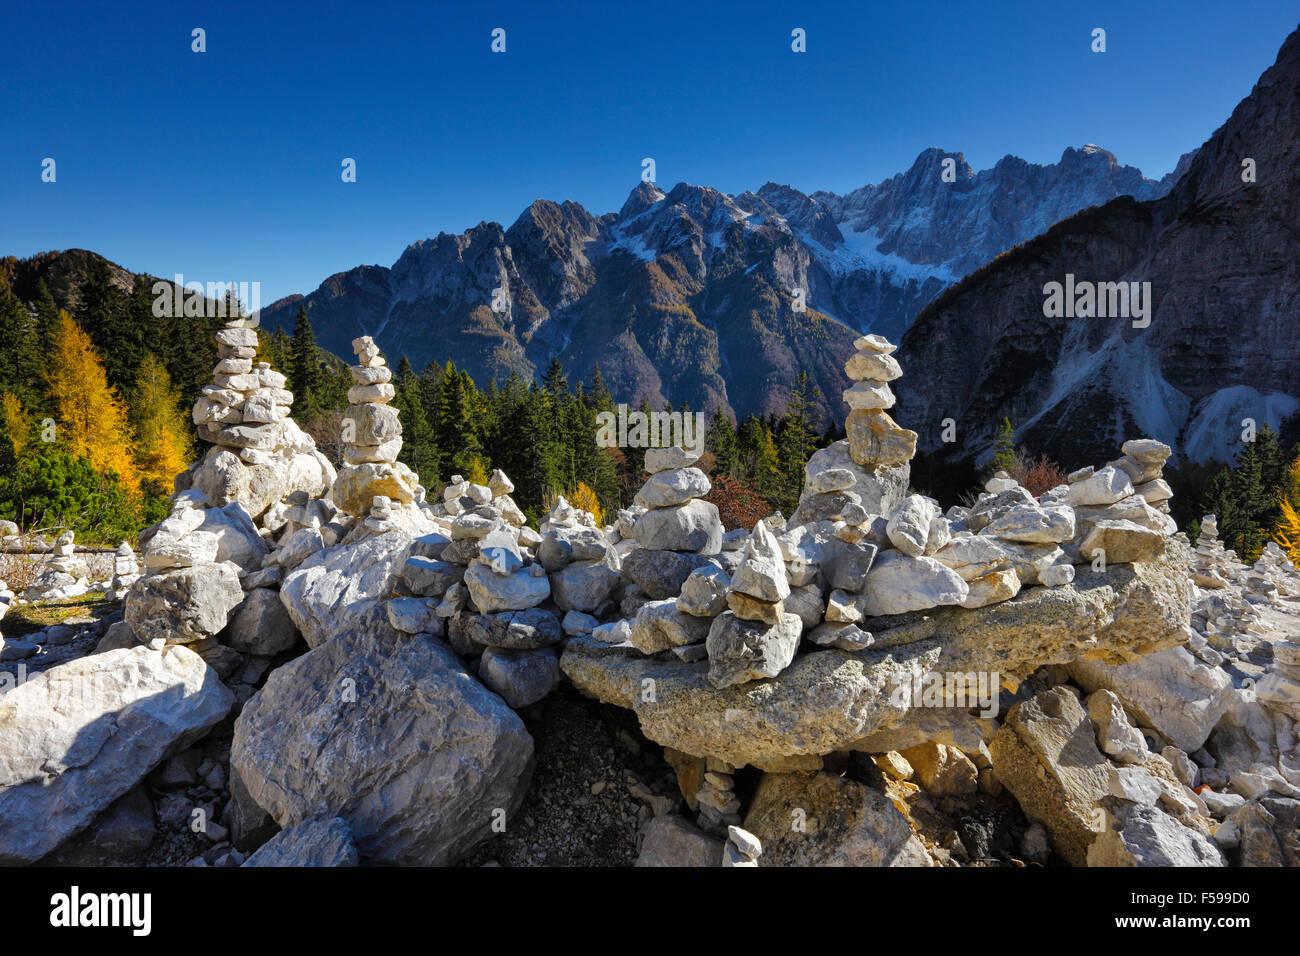 Torres de piedra en Alpes Julianos en Eslovenia, montaña Vrsic Pass Imagen De Stock